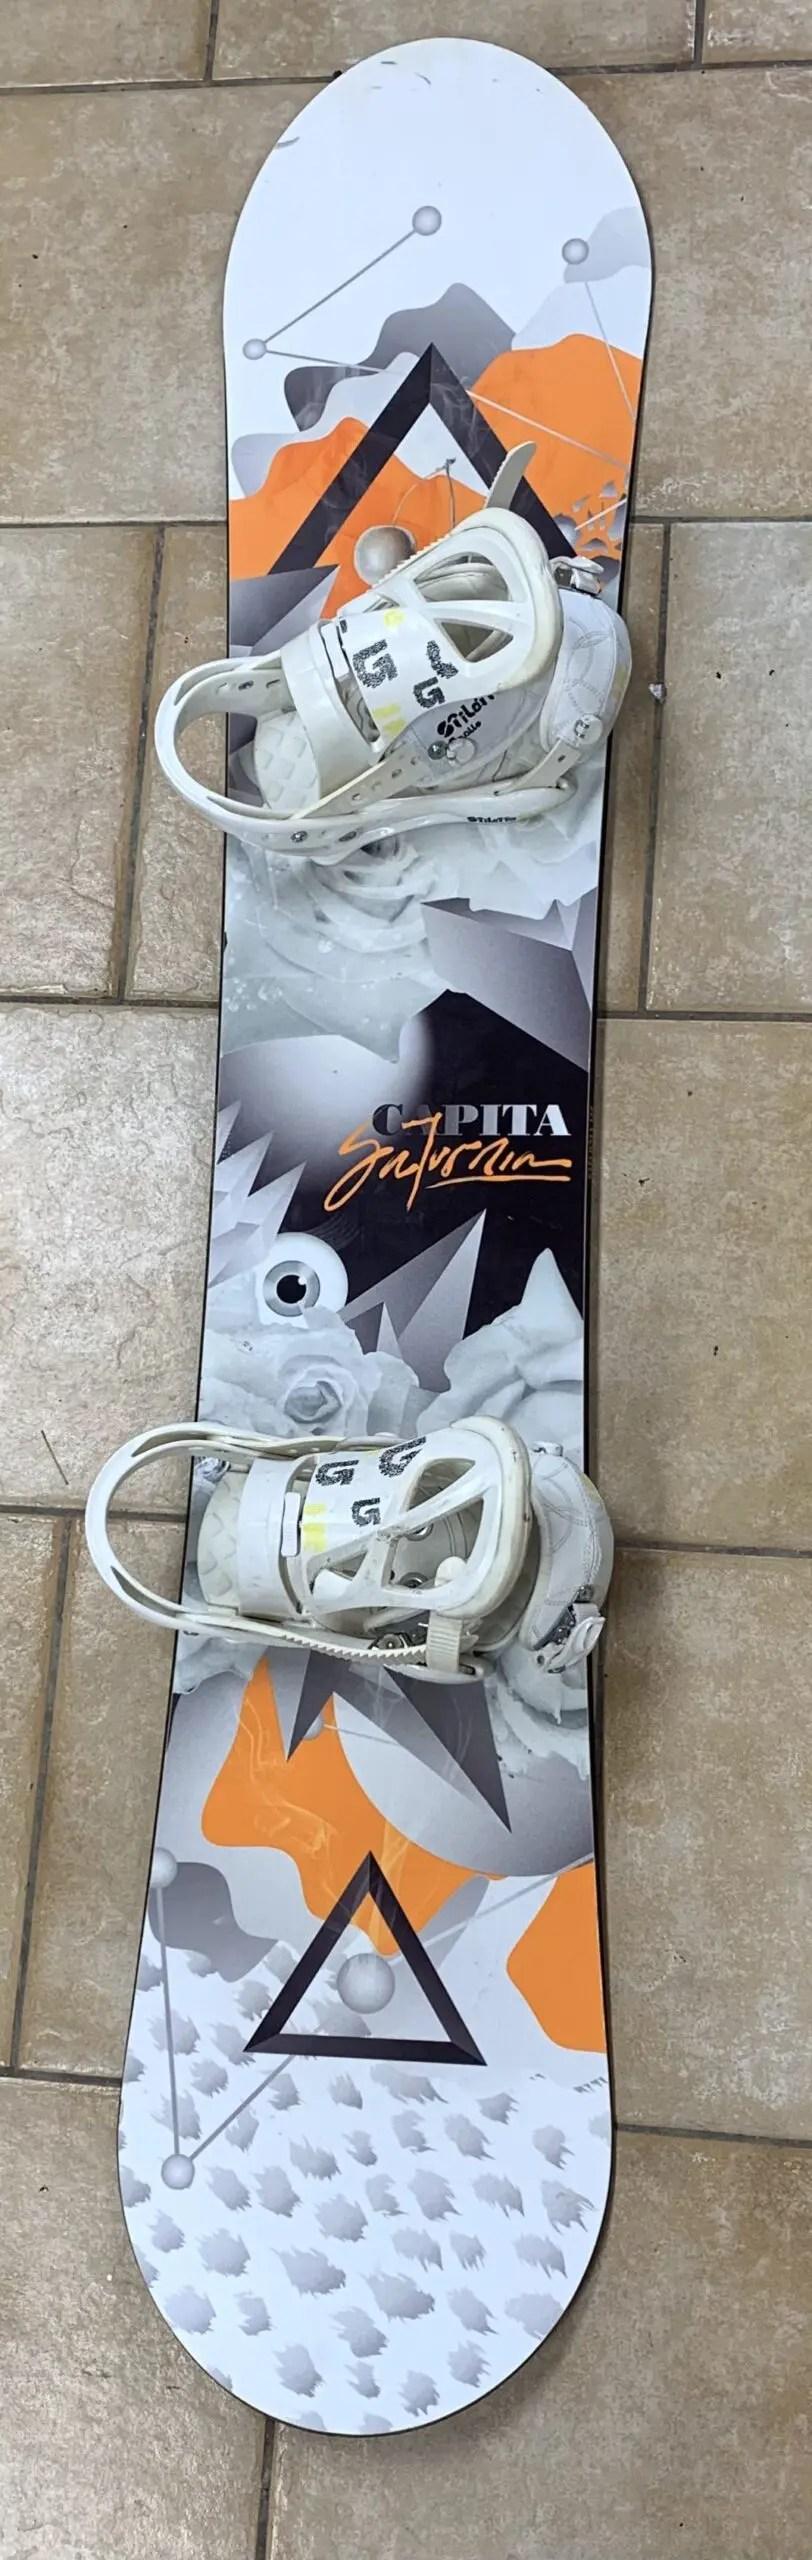 Capita Saturnia Women's Snowboard 152 cm with Burton Stiletto Binding